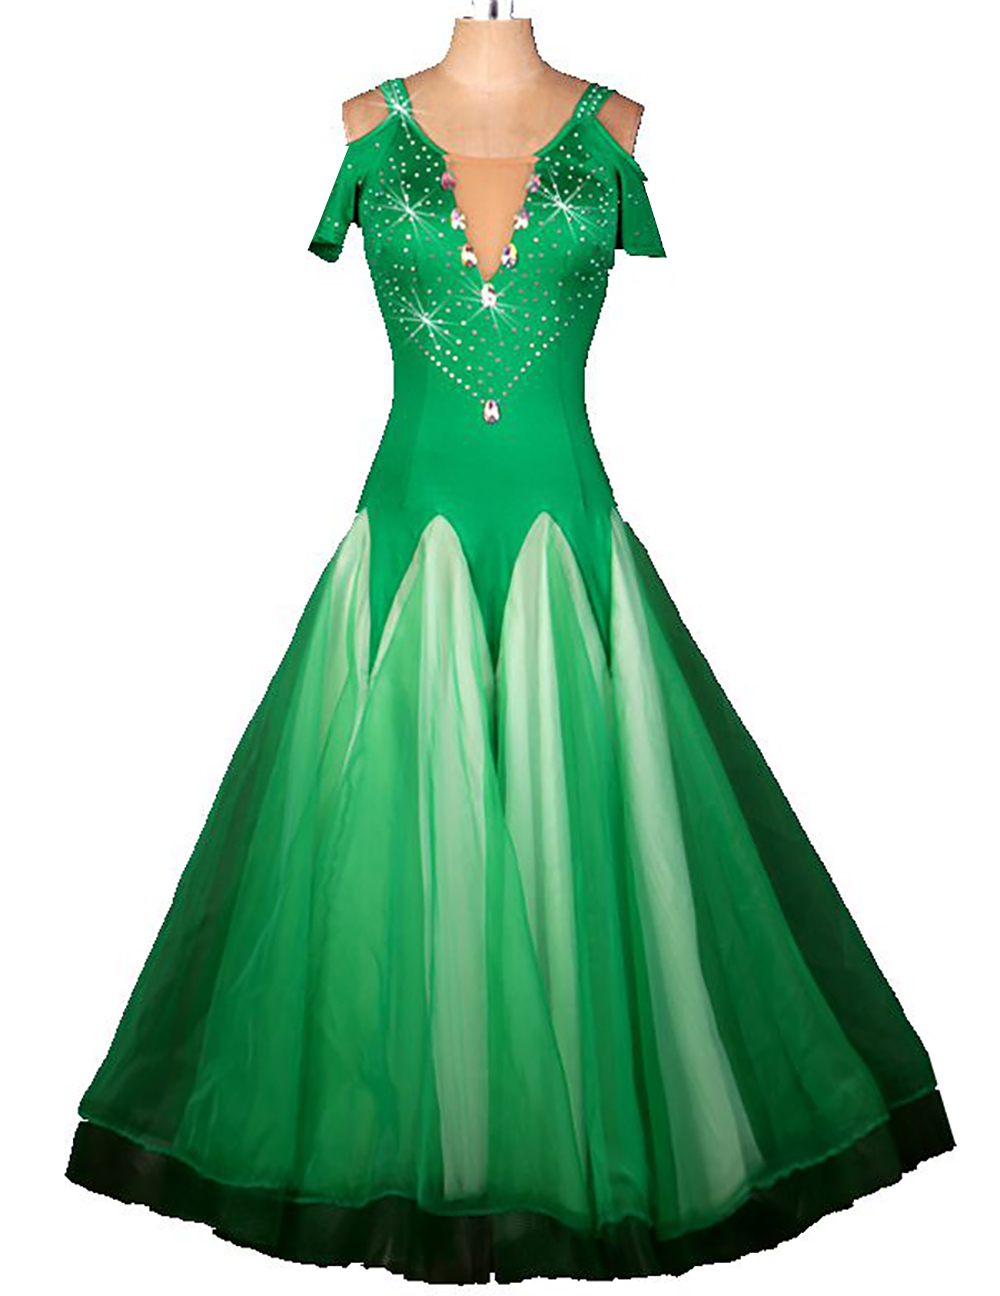 US $64.08 28% OFF|plus size green rhinestone Tassel Ballroom dancing  dresses Viennese standard ballroom dance dress ladies ballroom dance  dresses-in ...